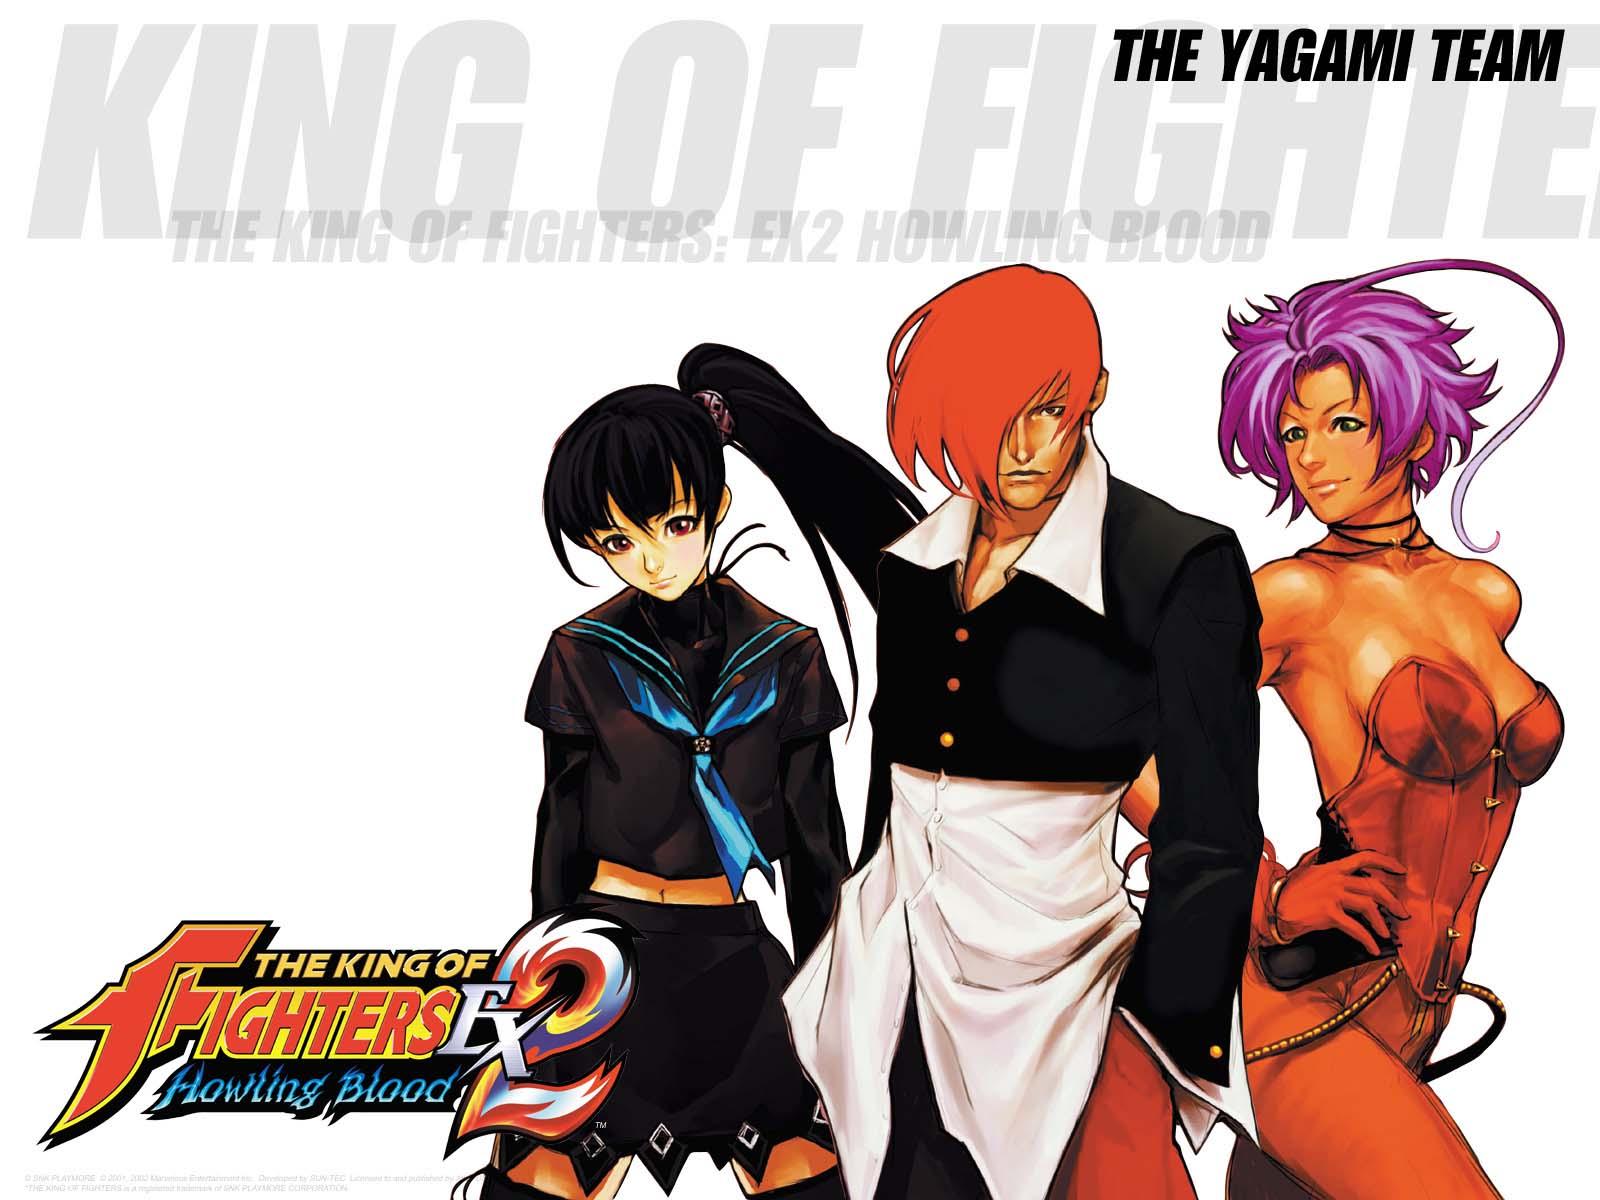 http://1.bp.blogspot.com/-VOrB1BMYhsk/Tk9dzDeTXJI/AAAAAAAAZGU/m9ZKVqlTIK4/s1600/kof_wallpaper_yagami.jpg